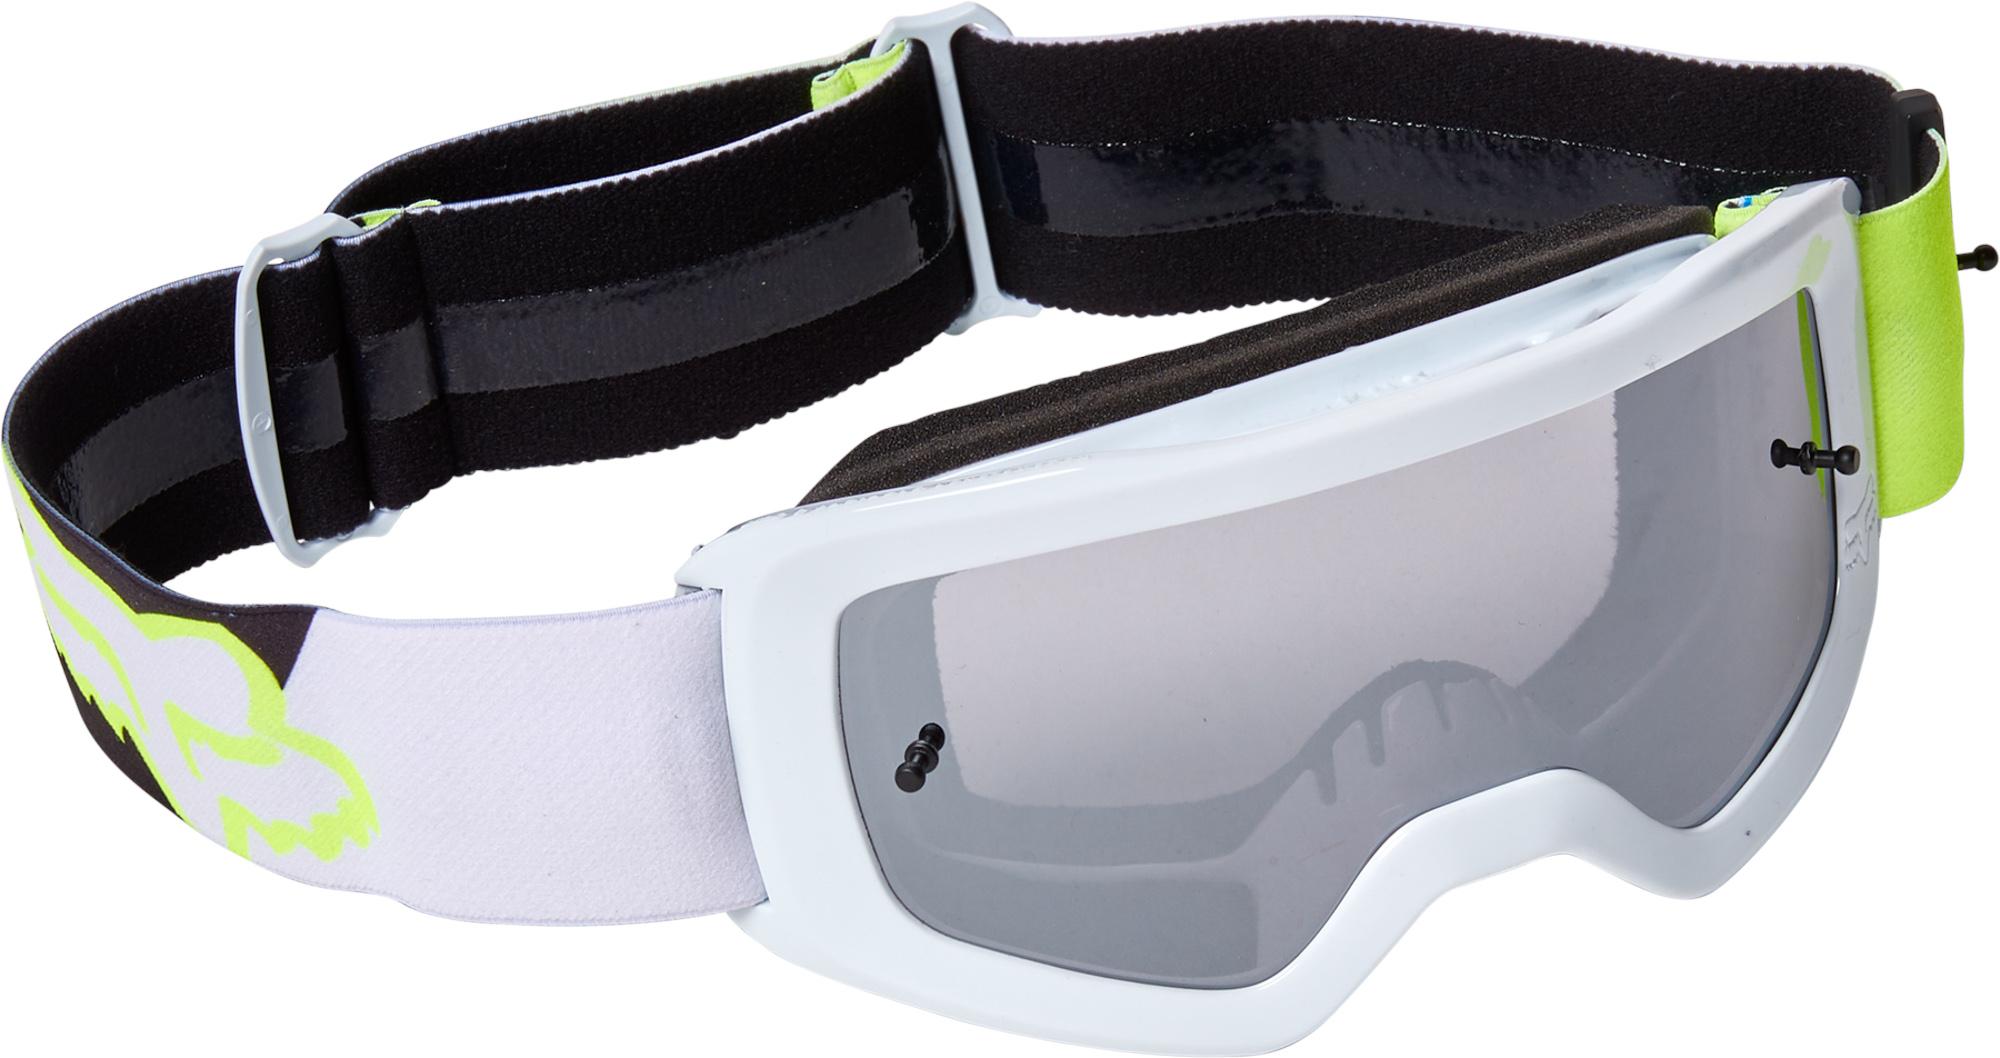 FOX Yth Main Skew Goggle Spk - OS, Fluo Yellow MX22